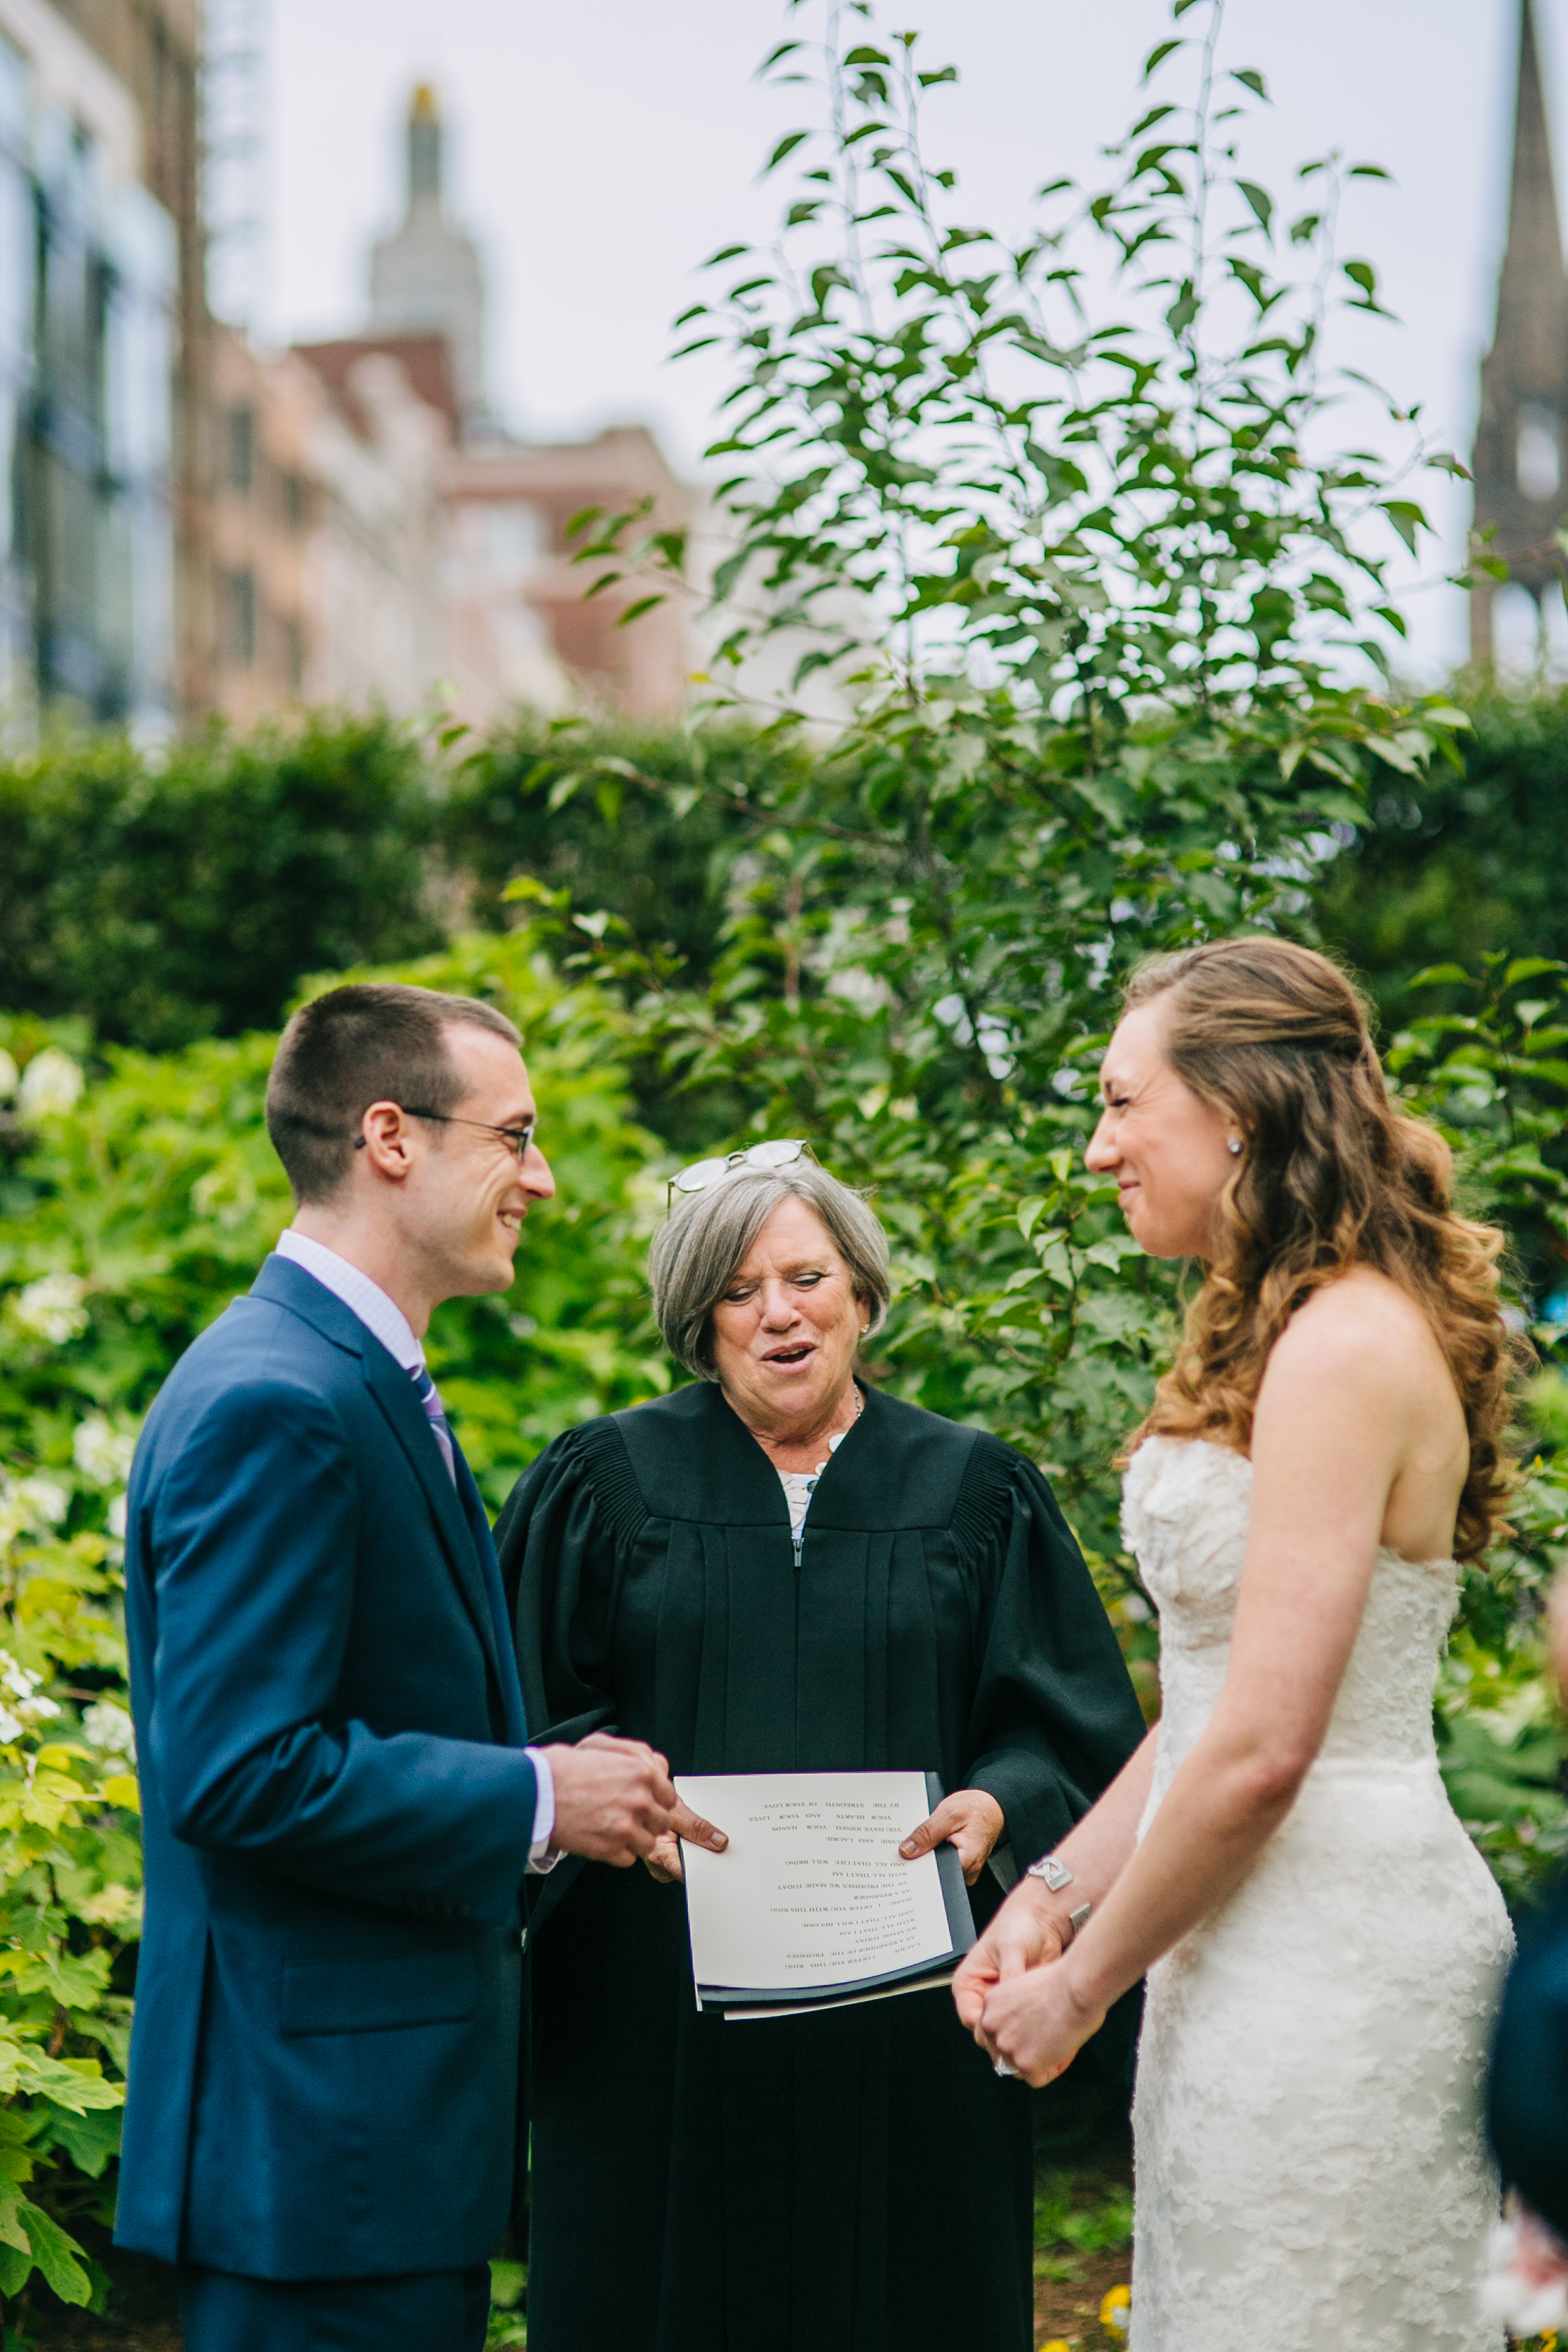 Emily Tebbetts Wedding Photography Boston Beacon Hill Boston Public Gardens Elopement Wedding Impromtpu